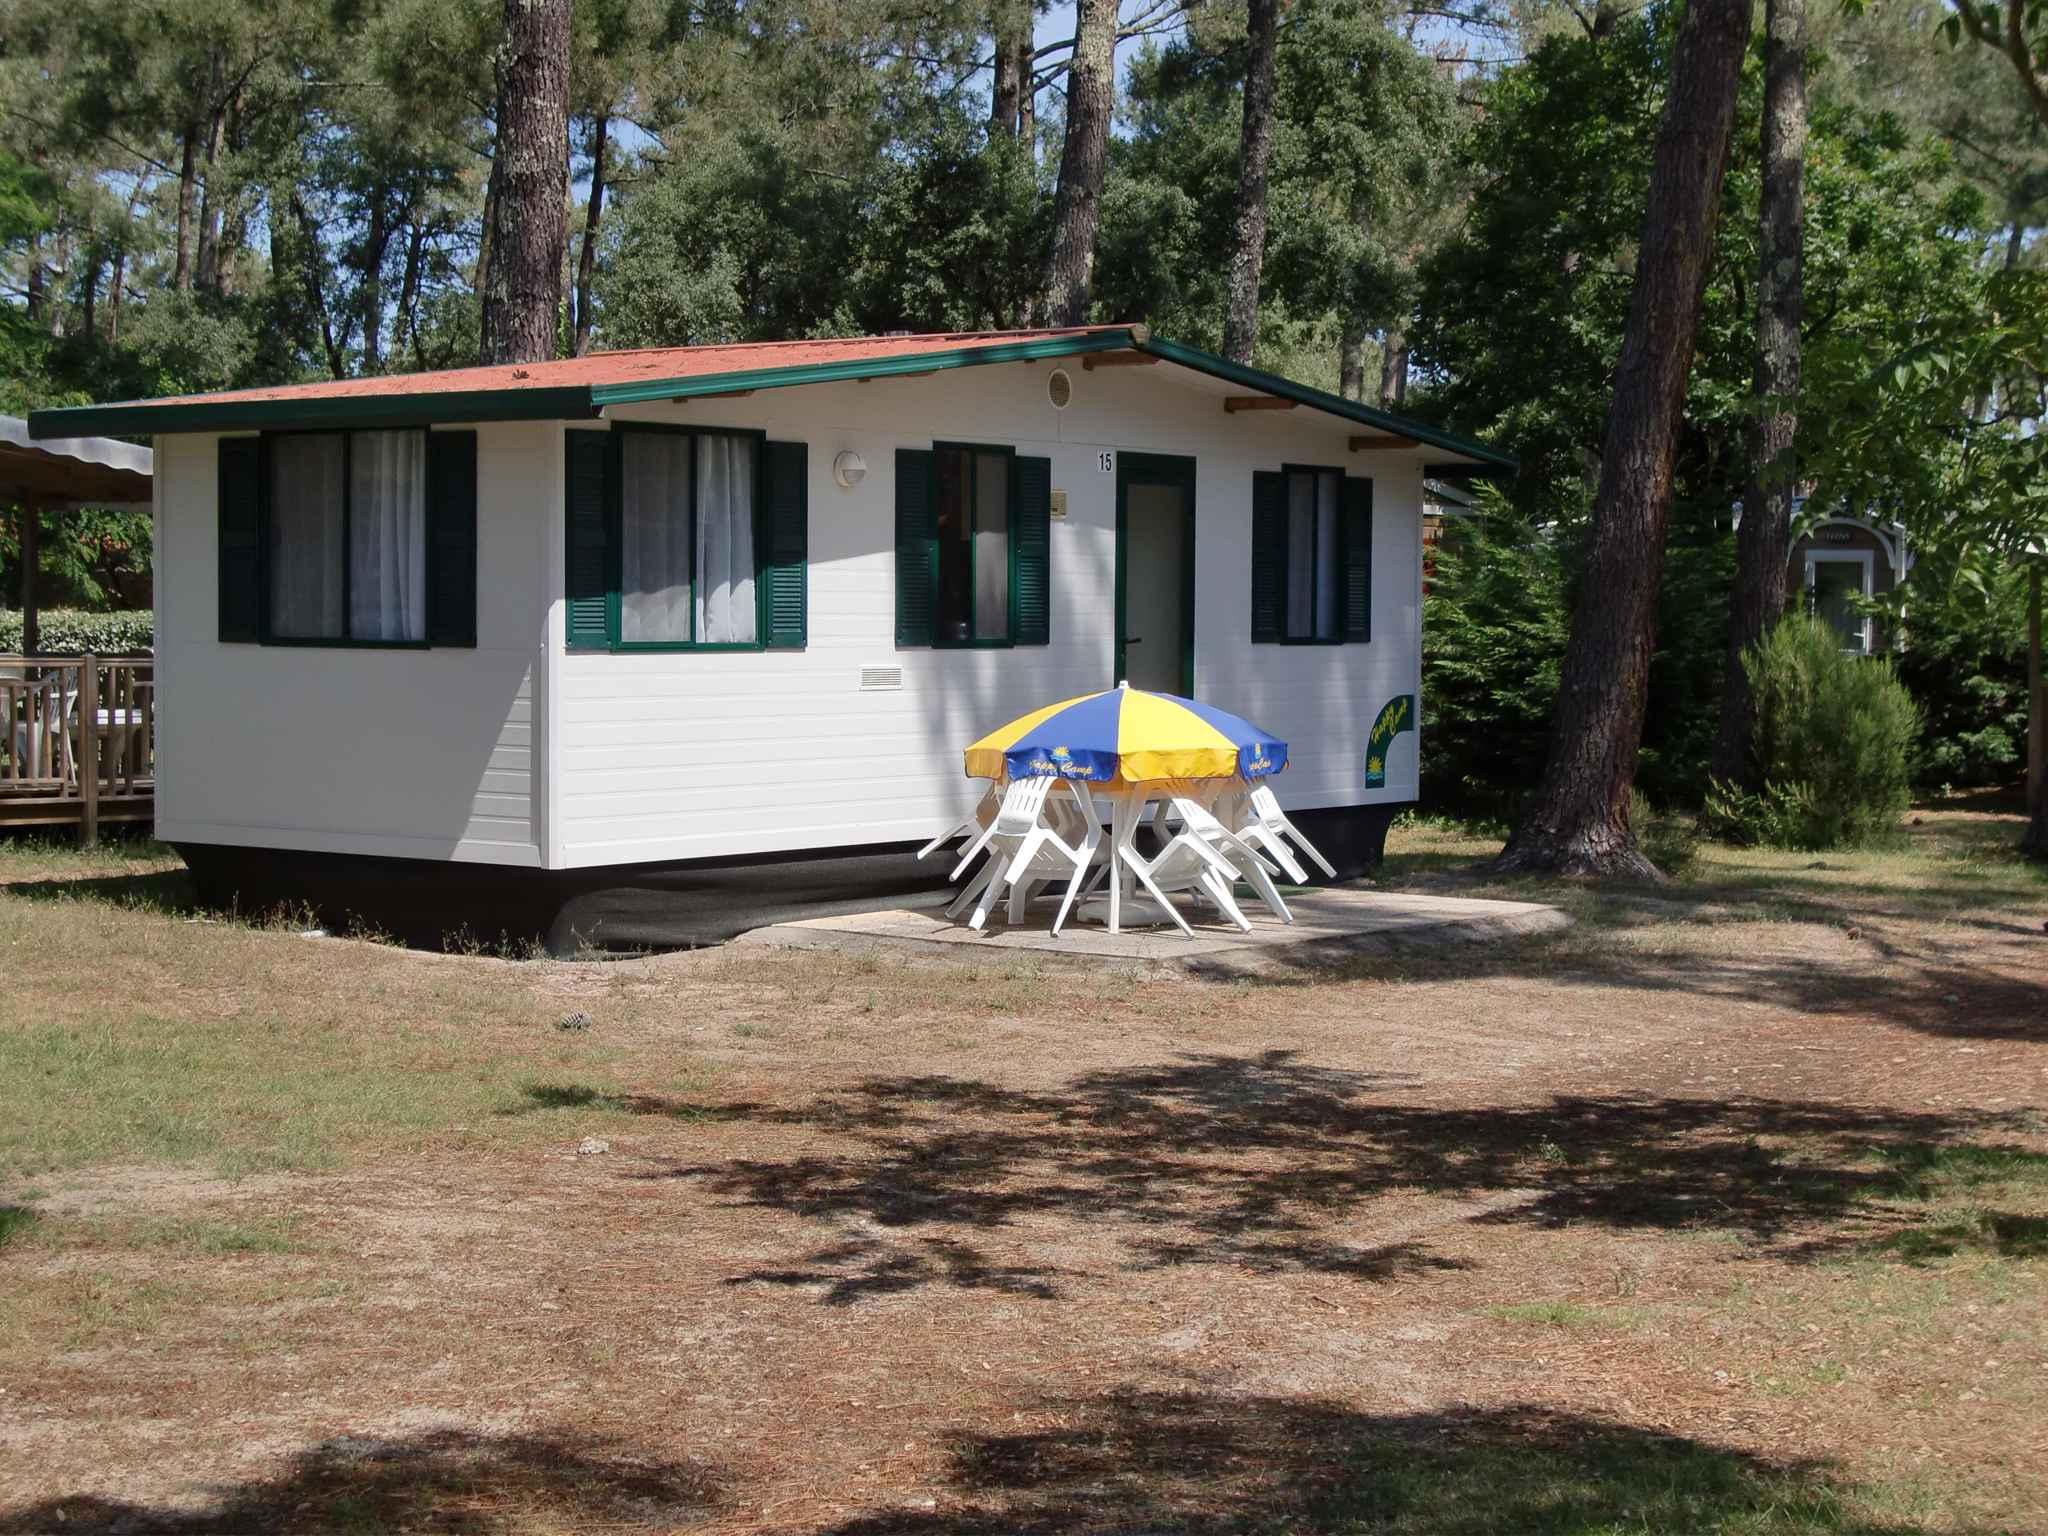 Appartement de vacances Mobilehome mit Tischtennis und Fahrradverleih (2483443), San Vito Lo Capo, Trapani, Sicile, Italie, image 2